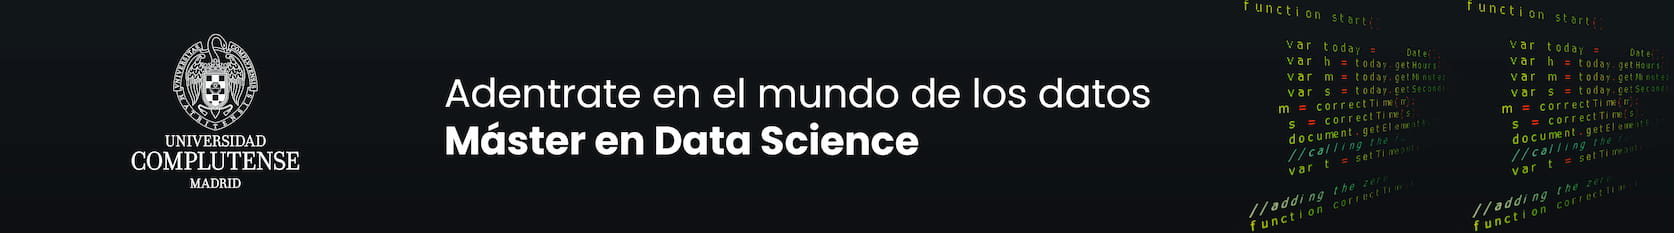 Banner2-de-redireccion-a-master-data-science